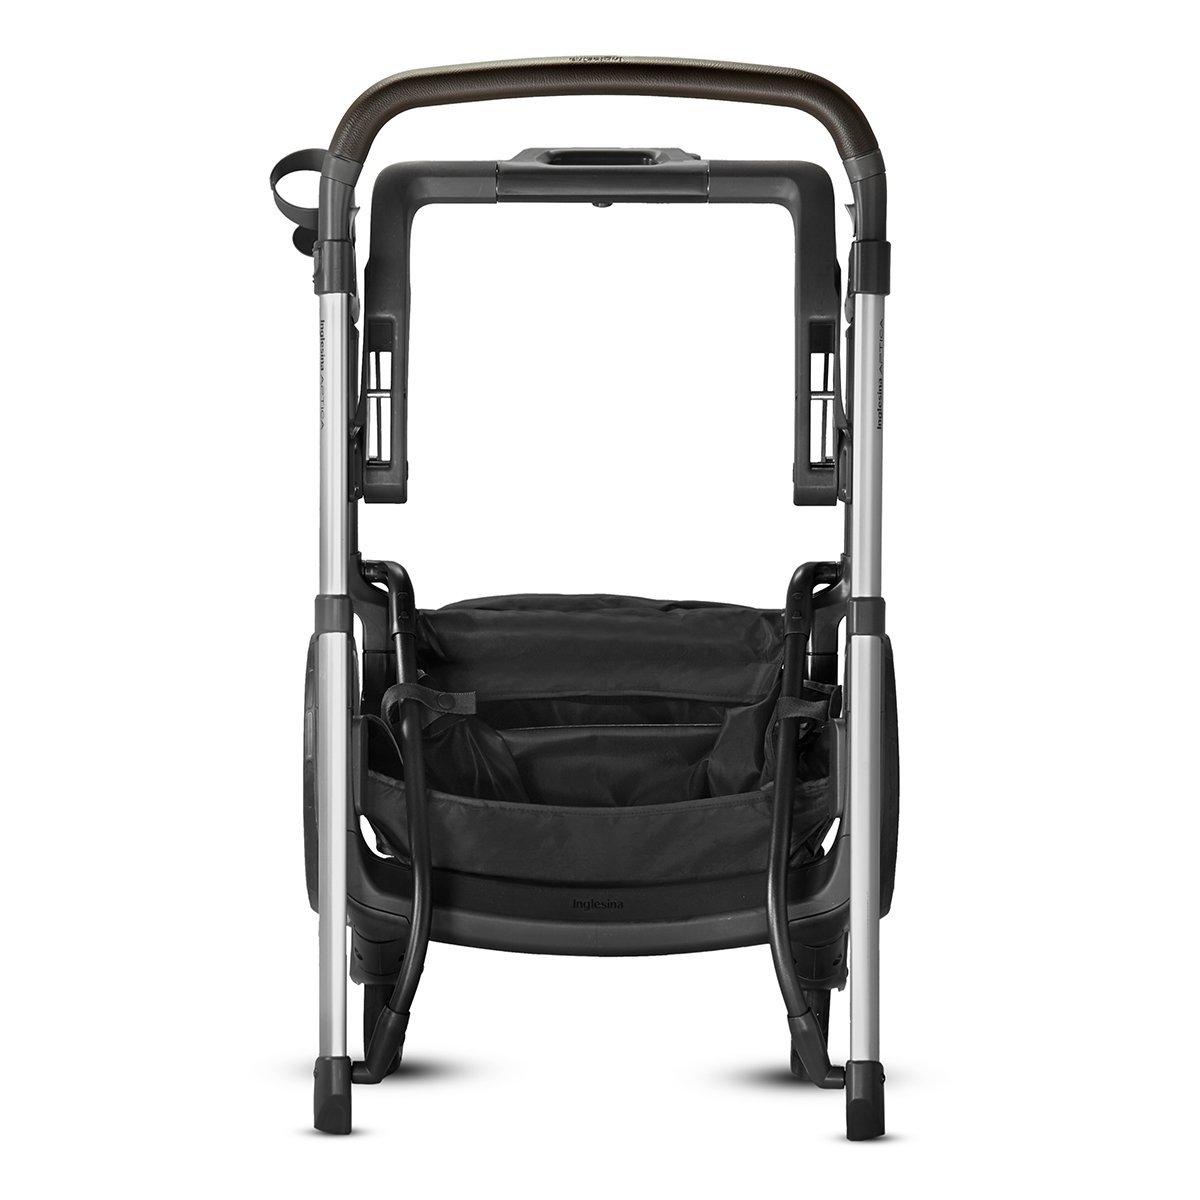 Купить Аксессуары для колясок, Шасси для коляски Inglesina Aptica Graphite Coffee AE70K6201 ТМ: Inglesina, серый